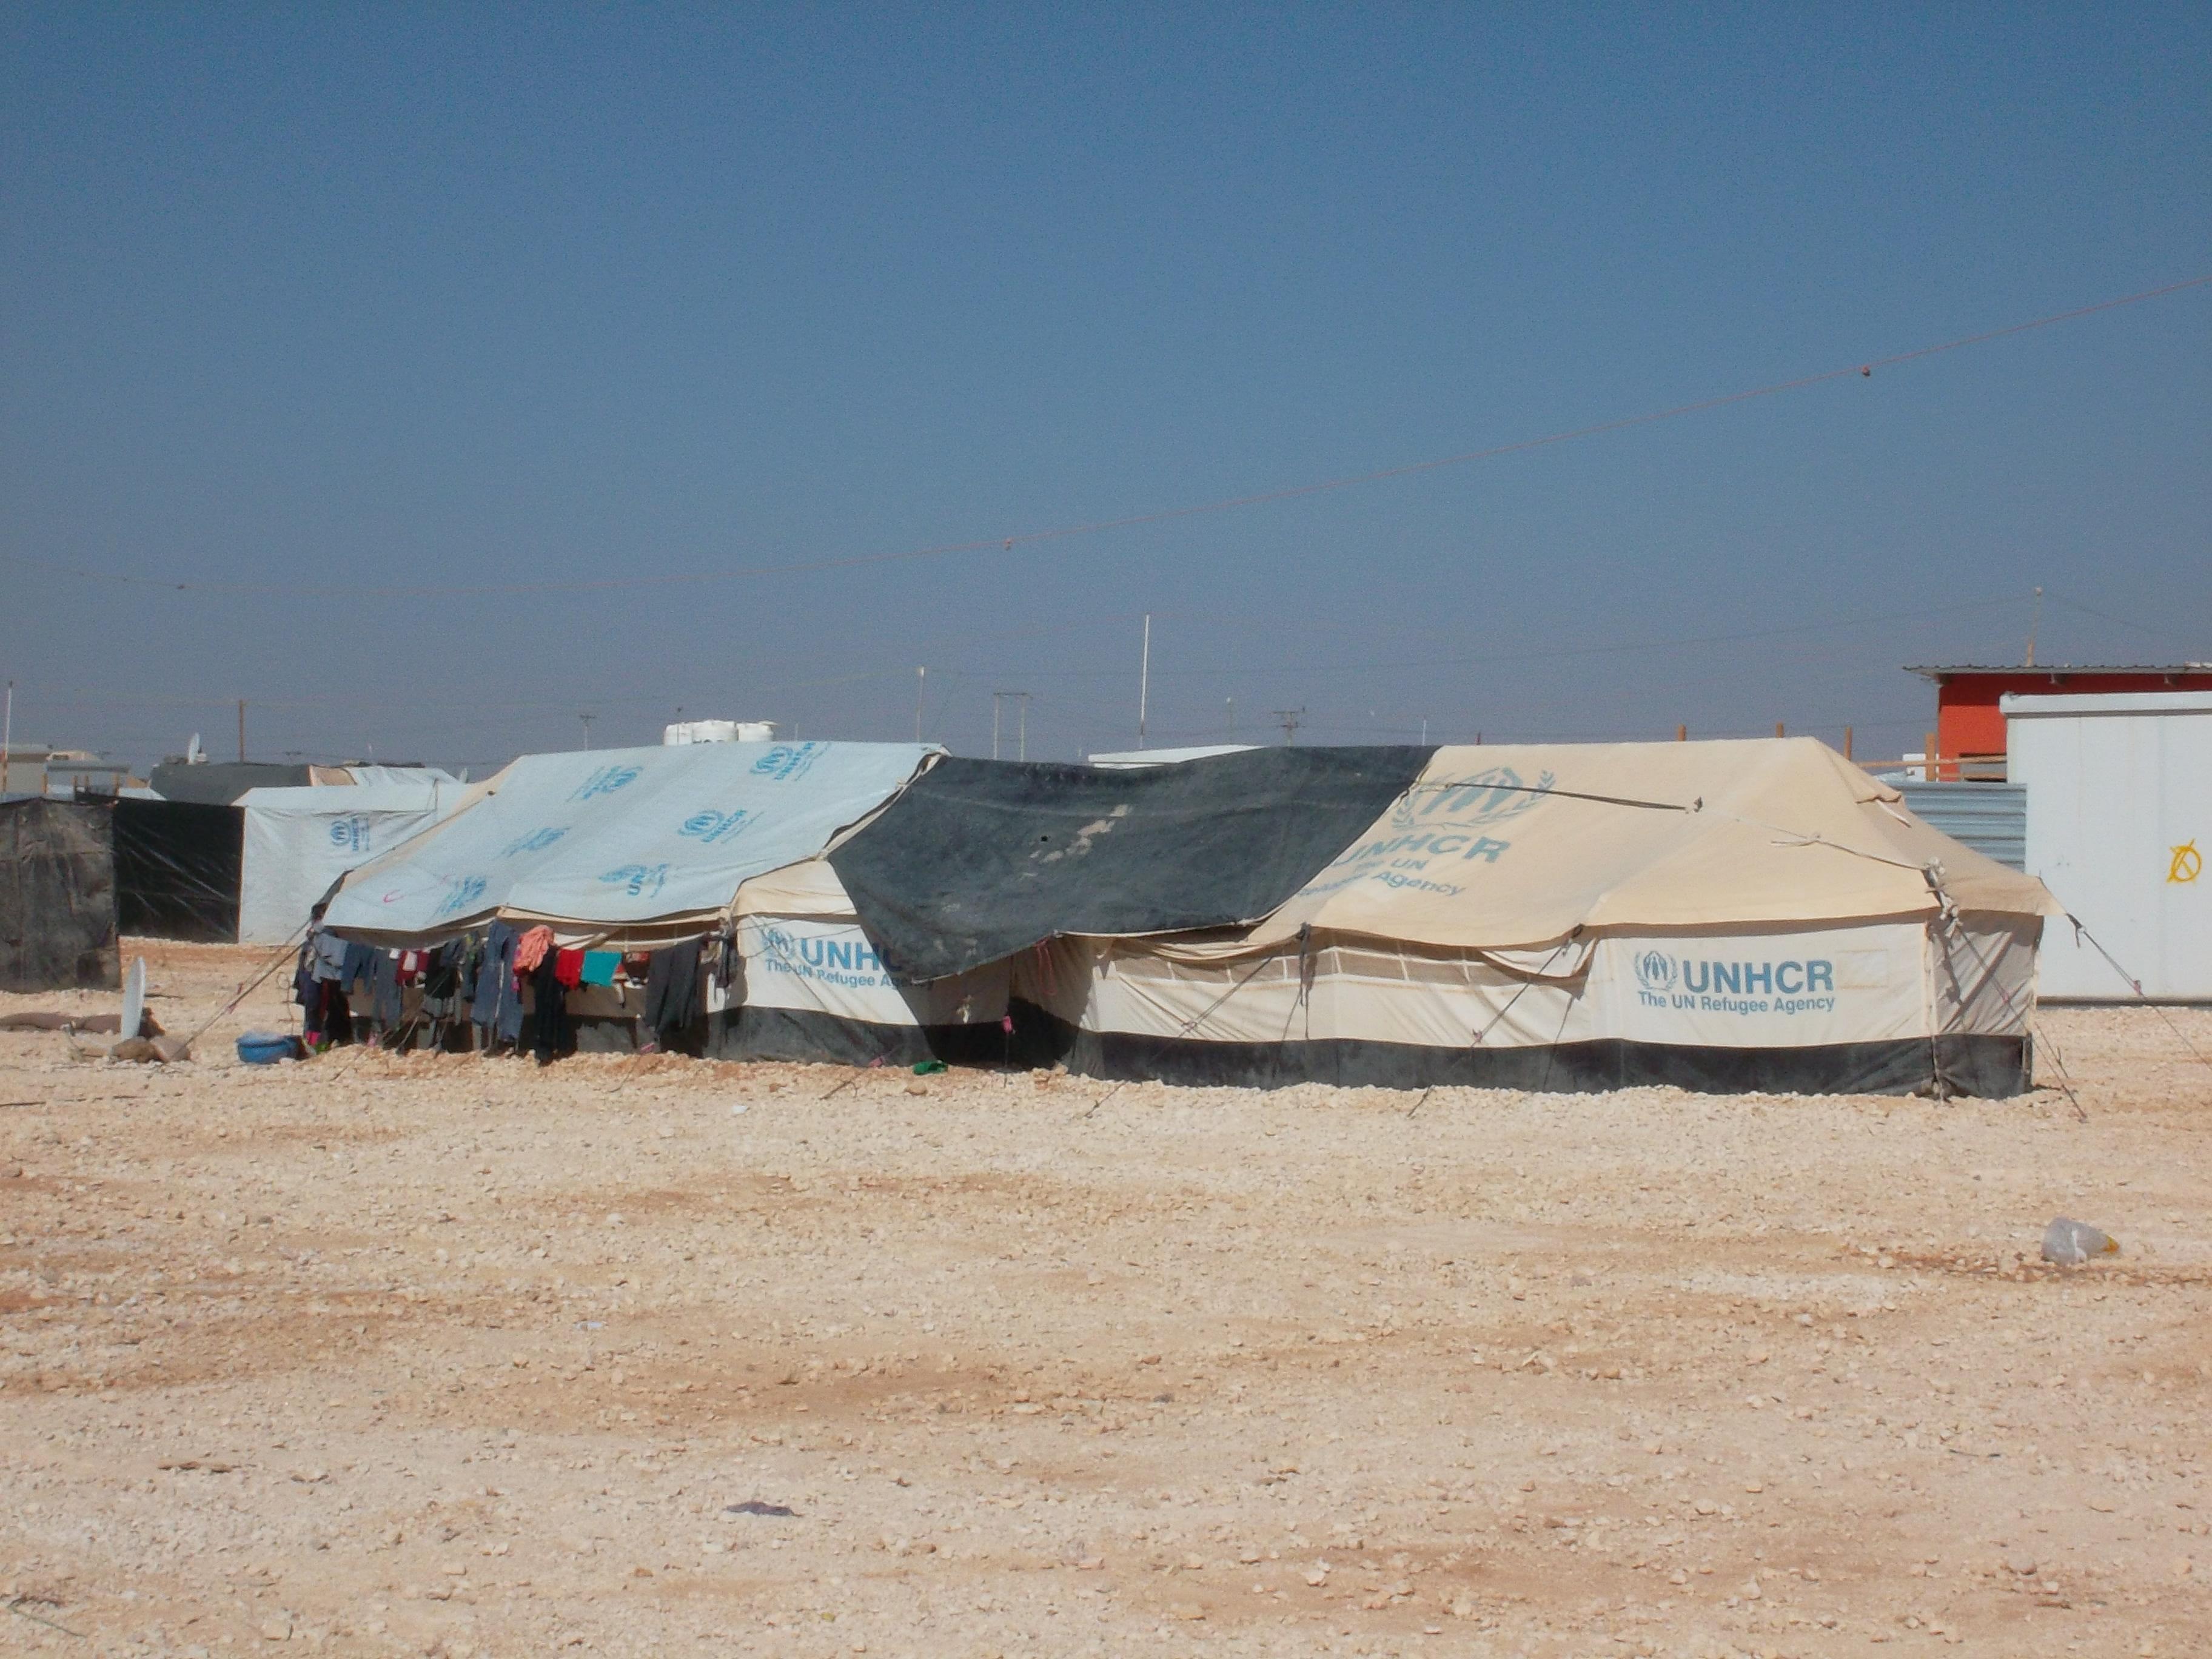 Un exemple d'habitat dans le camp de réfugiés de Zaatari, Jordanie